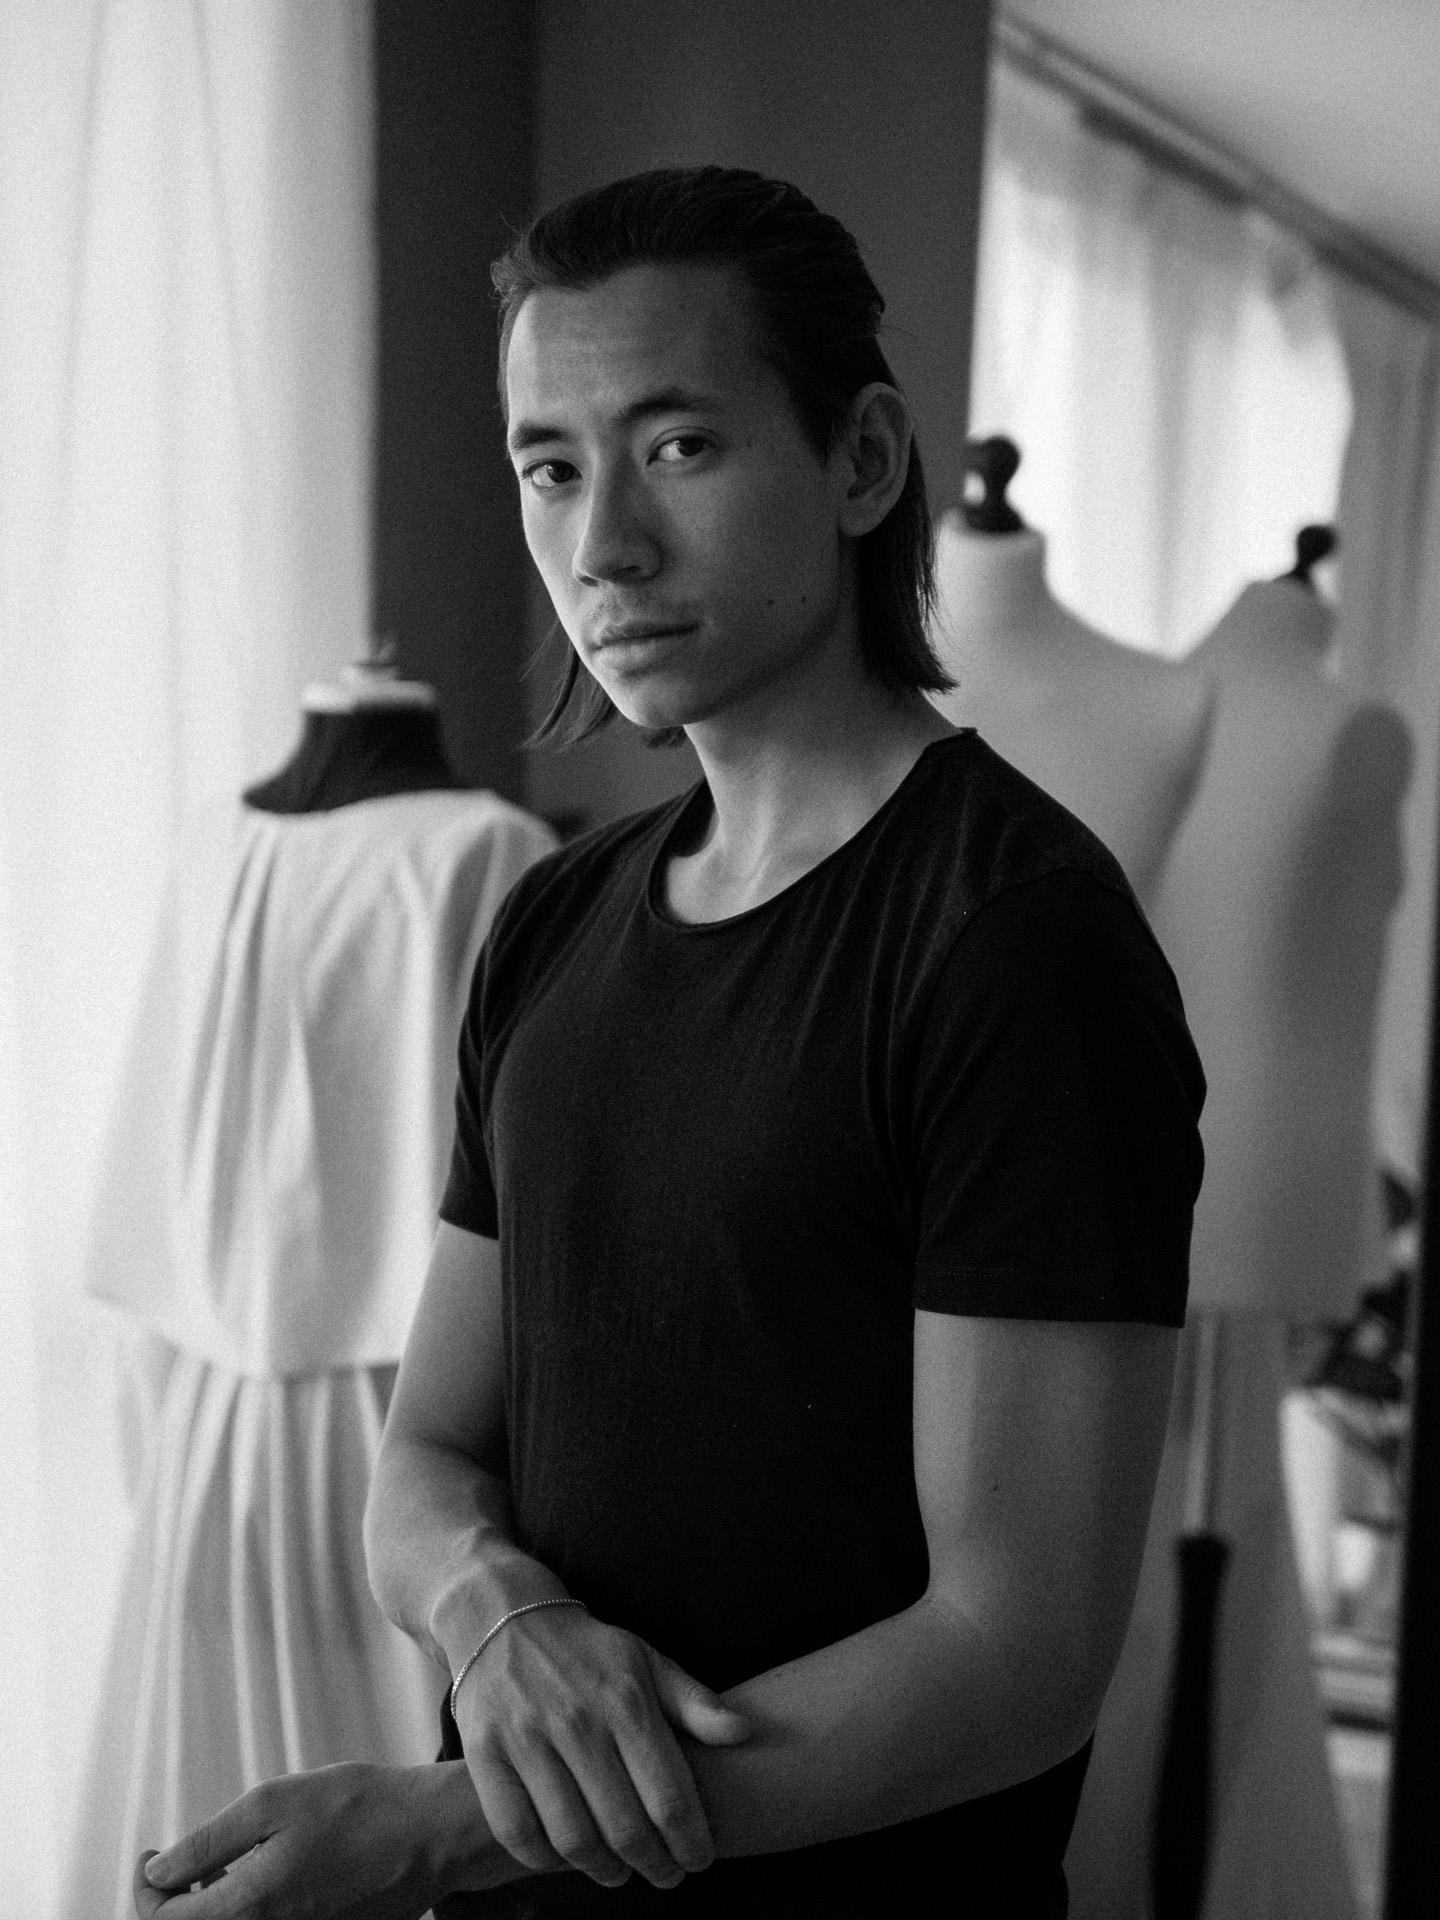 frank-lin-bio-biography-about-biografie-mode-fashion-designer-portrait